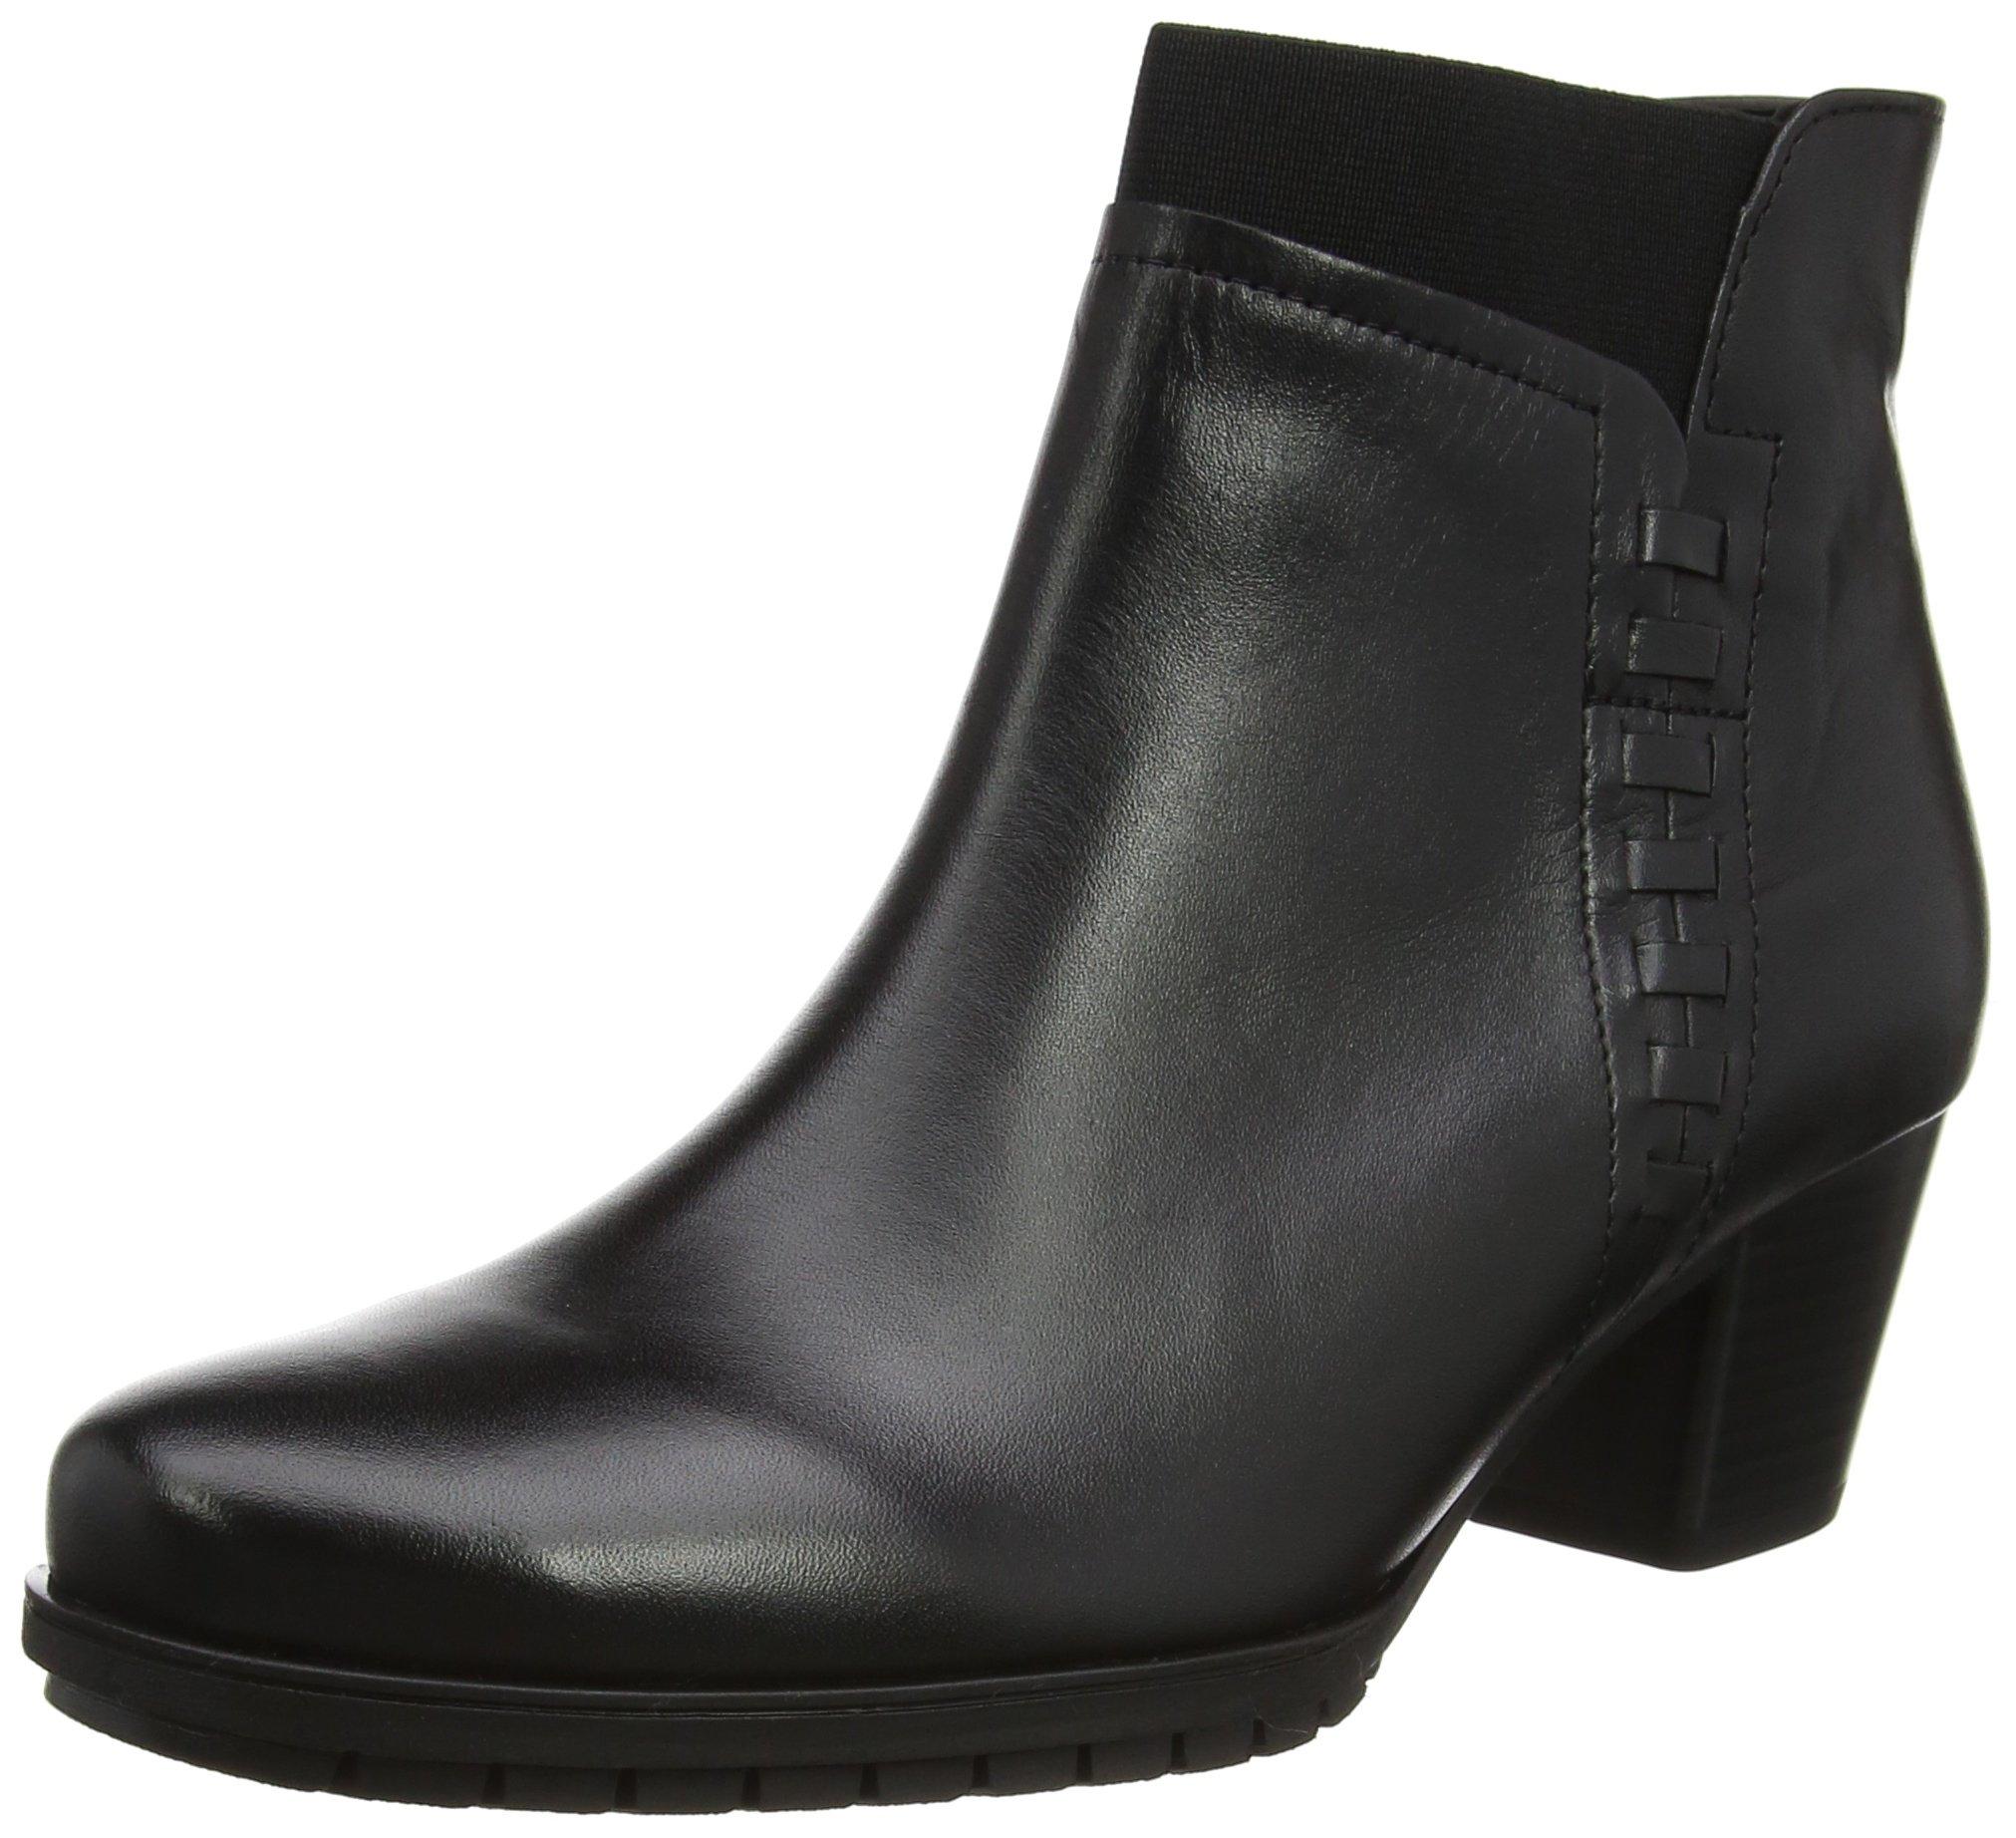 Shoes BasicBottes Micro38 5 Comfort Schwarz Eu Gabor FemmeNoir57 vO0ymNw8n